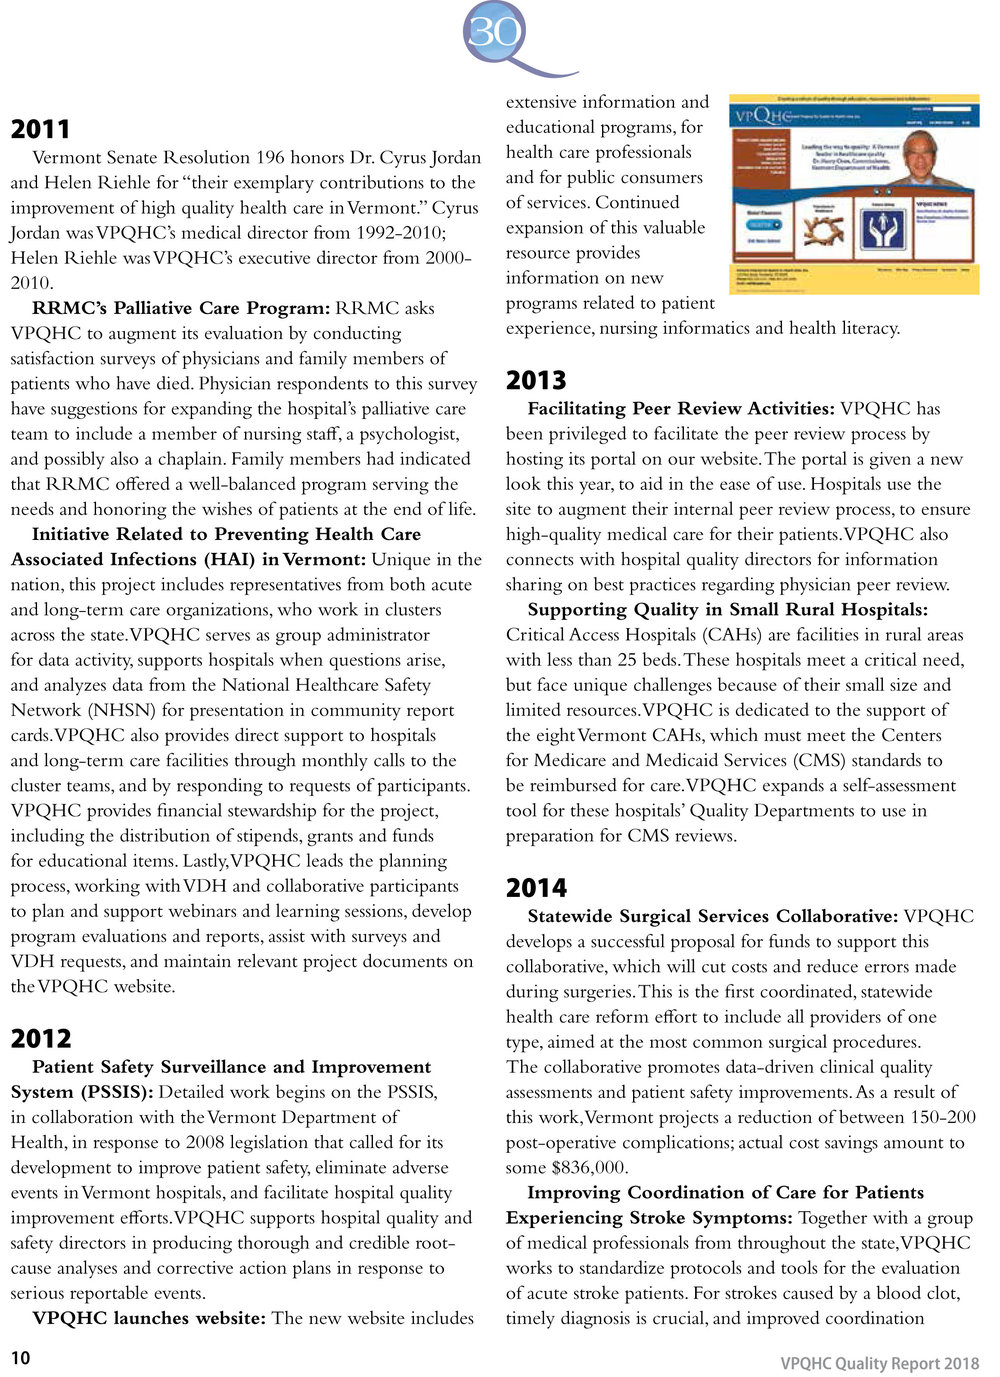 Timeline7.JPG